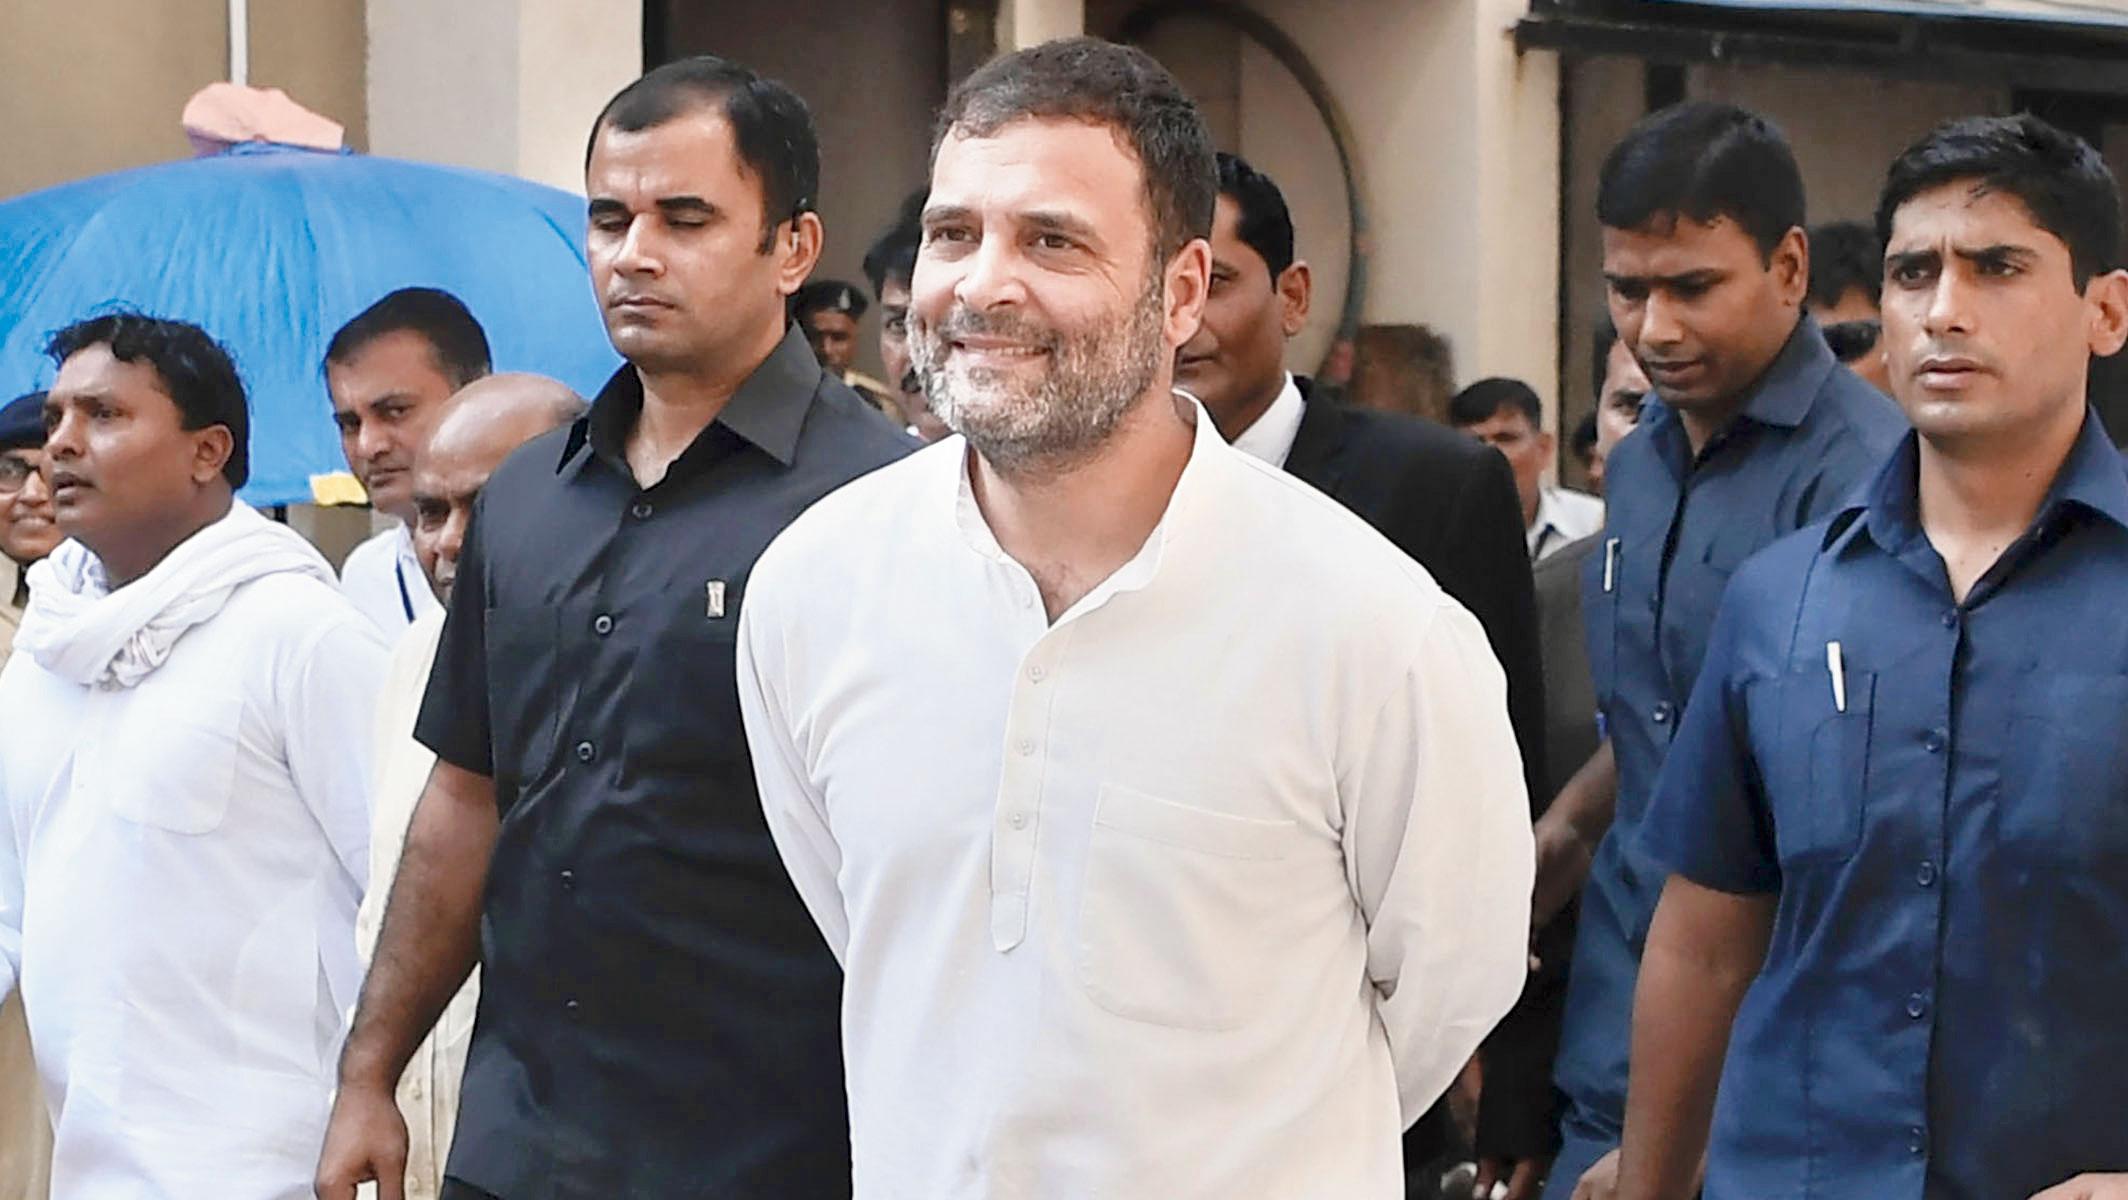 Rahul Gandhi outside the court in Surat on Thursday.